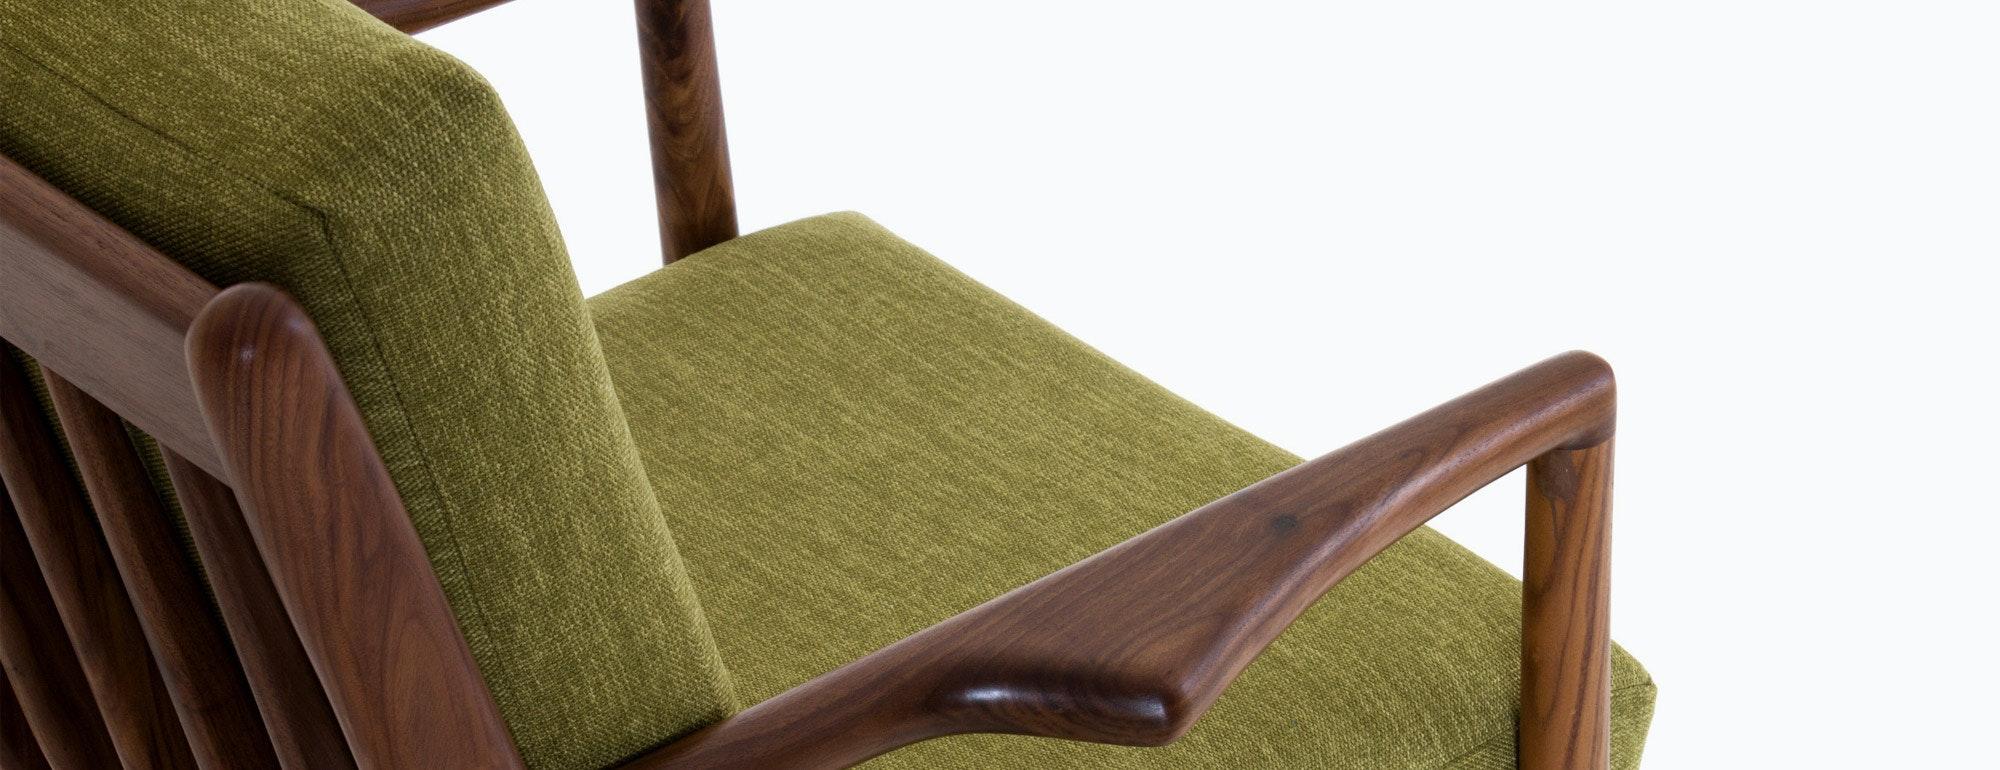 shown in Key Largo Grass Fabric